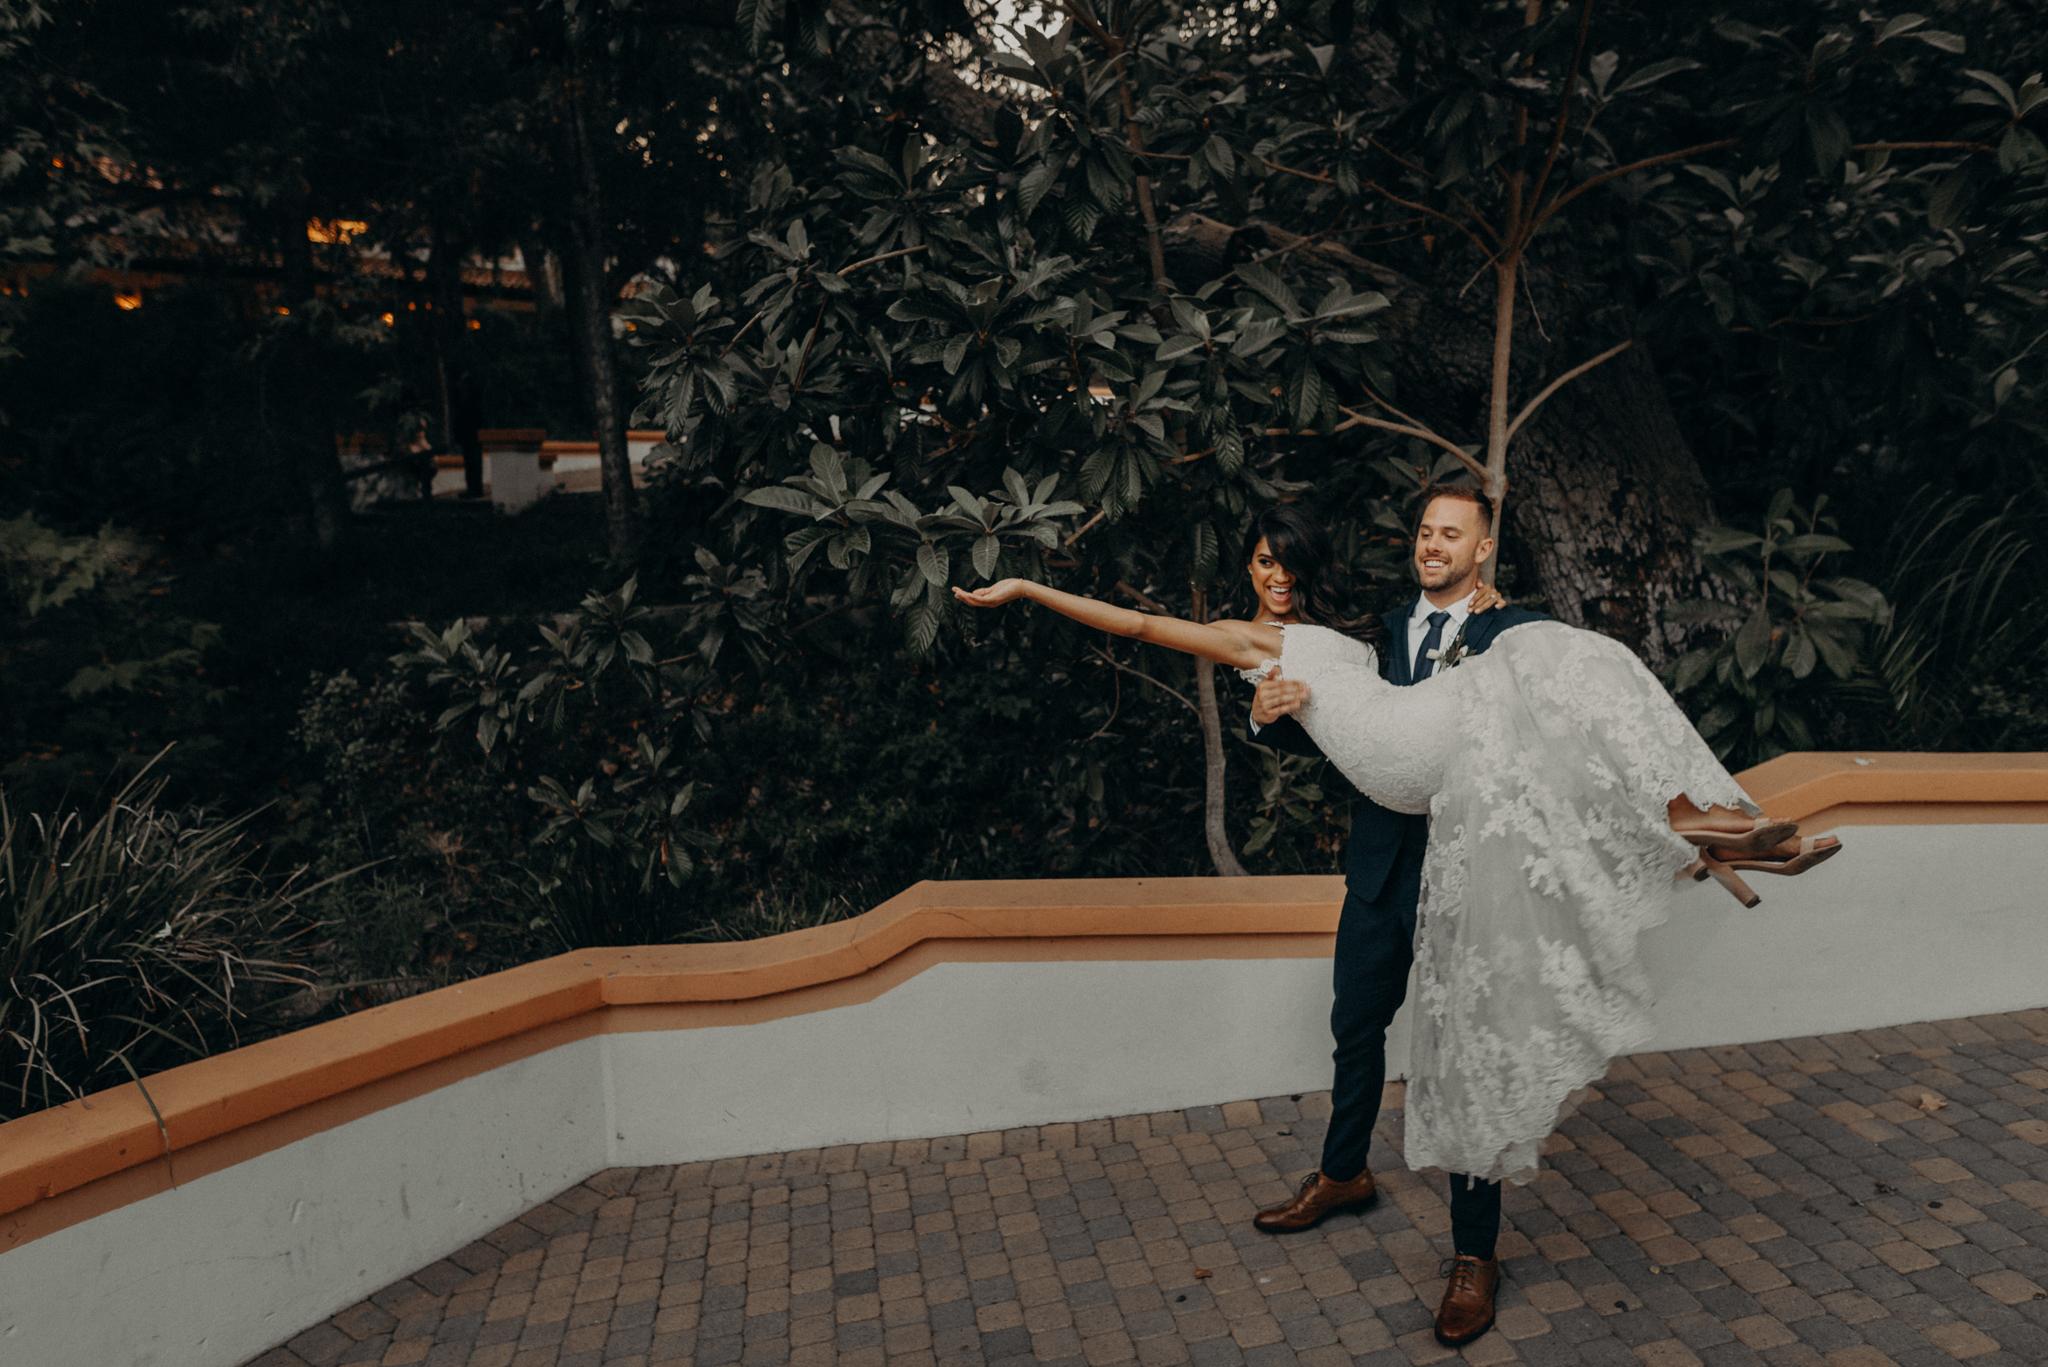 Isaiah + Taylor Photography - Rancho Las Lomas Wedding, Los Angeles Wedding Photographer-134.jpg